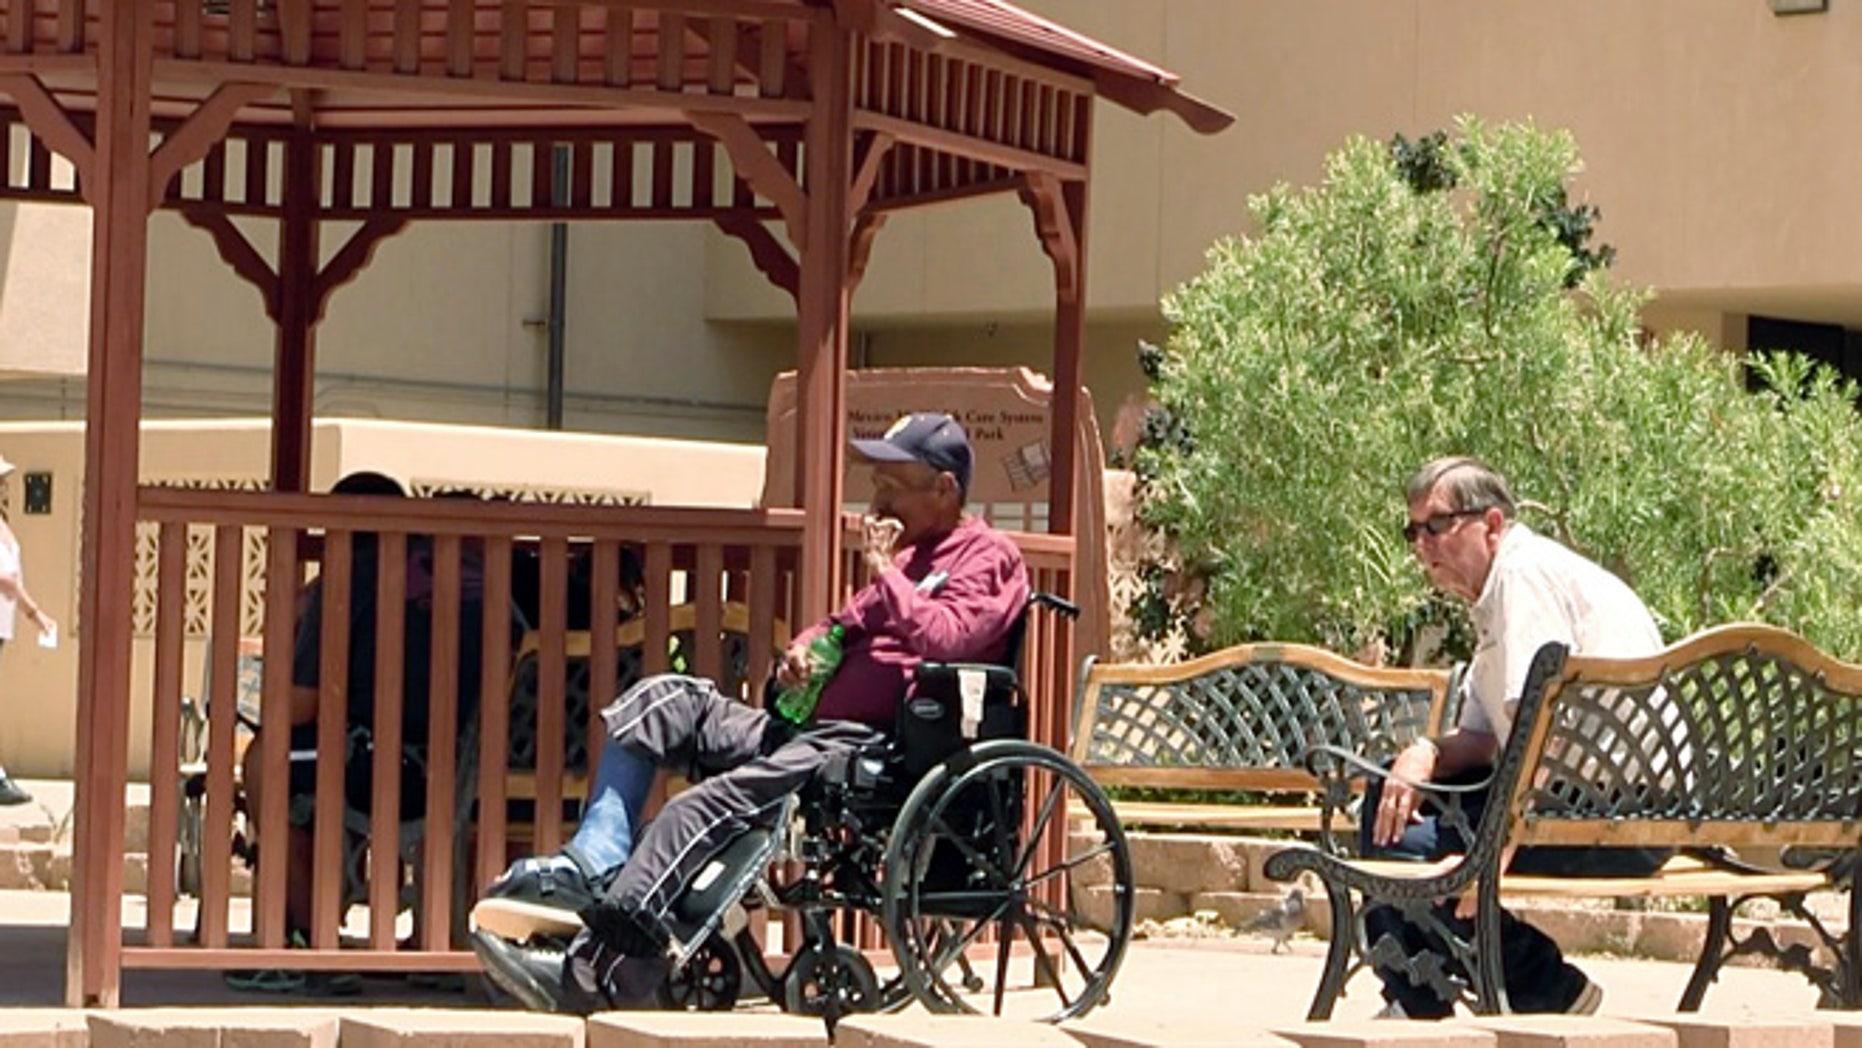 July 3, 2014: Men sit outside the Raymond G. Murphy VA Medical Center in Albuquerque, N.M..